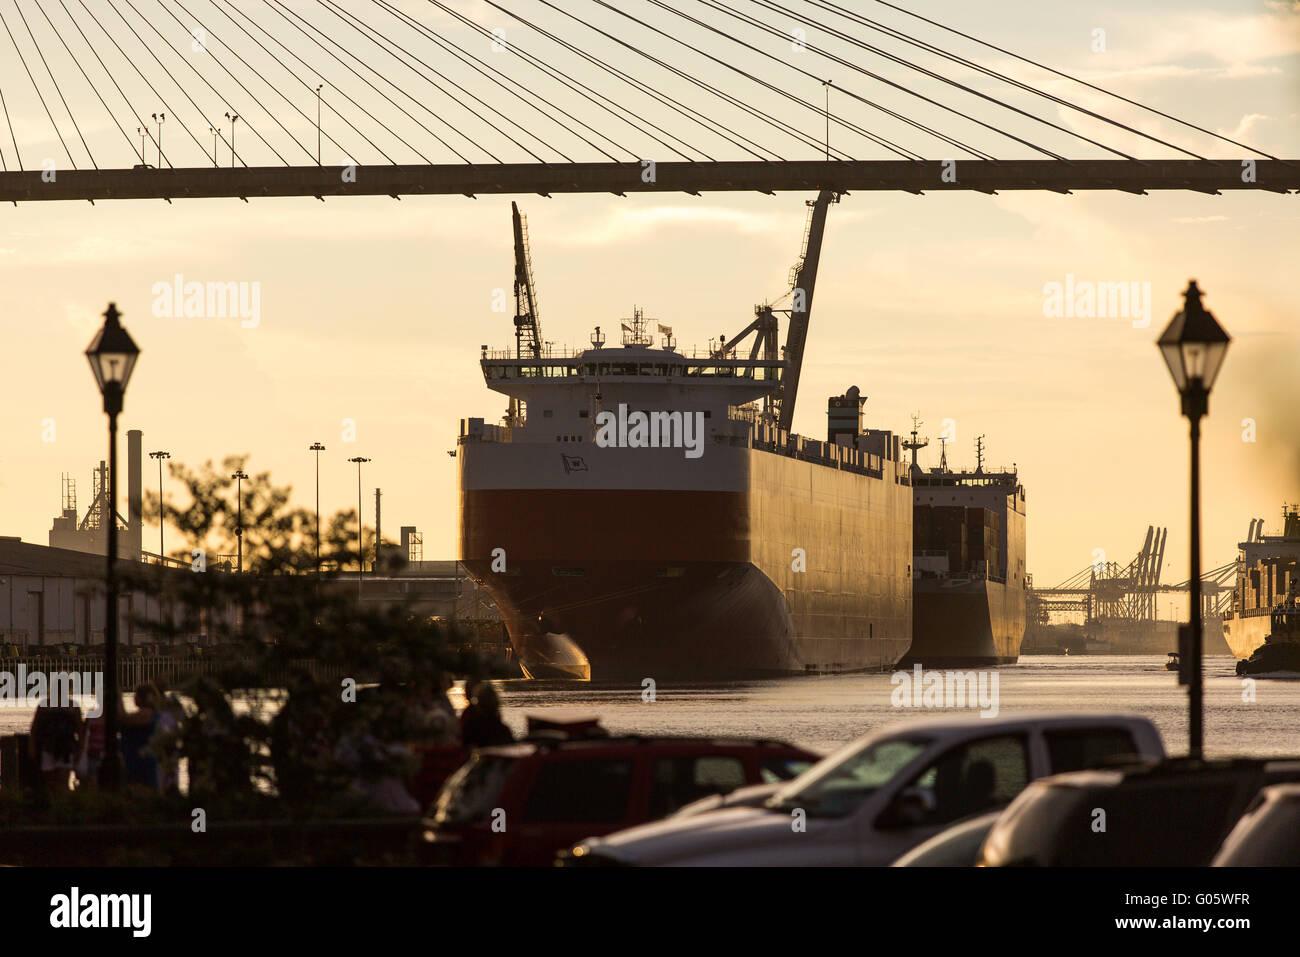 Container ship under the Talmadge Bridge - Stock Image